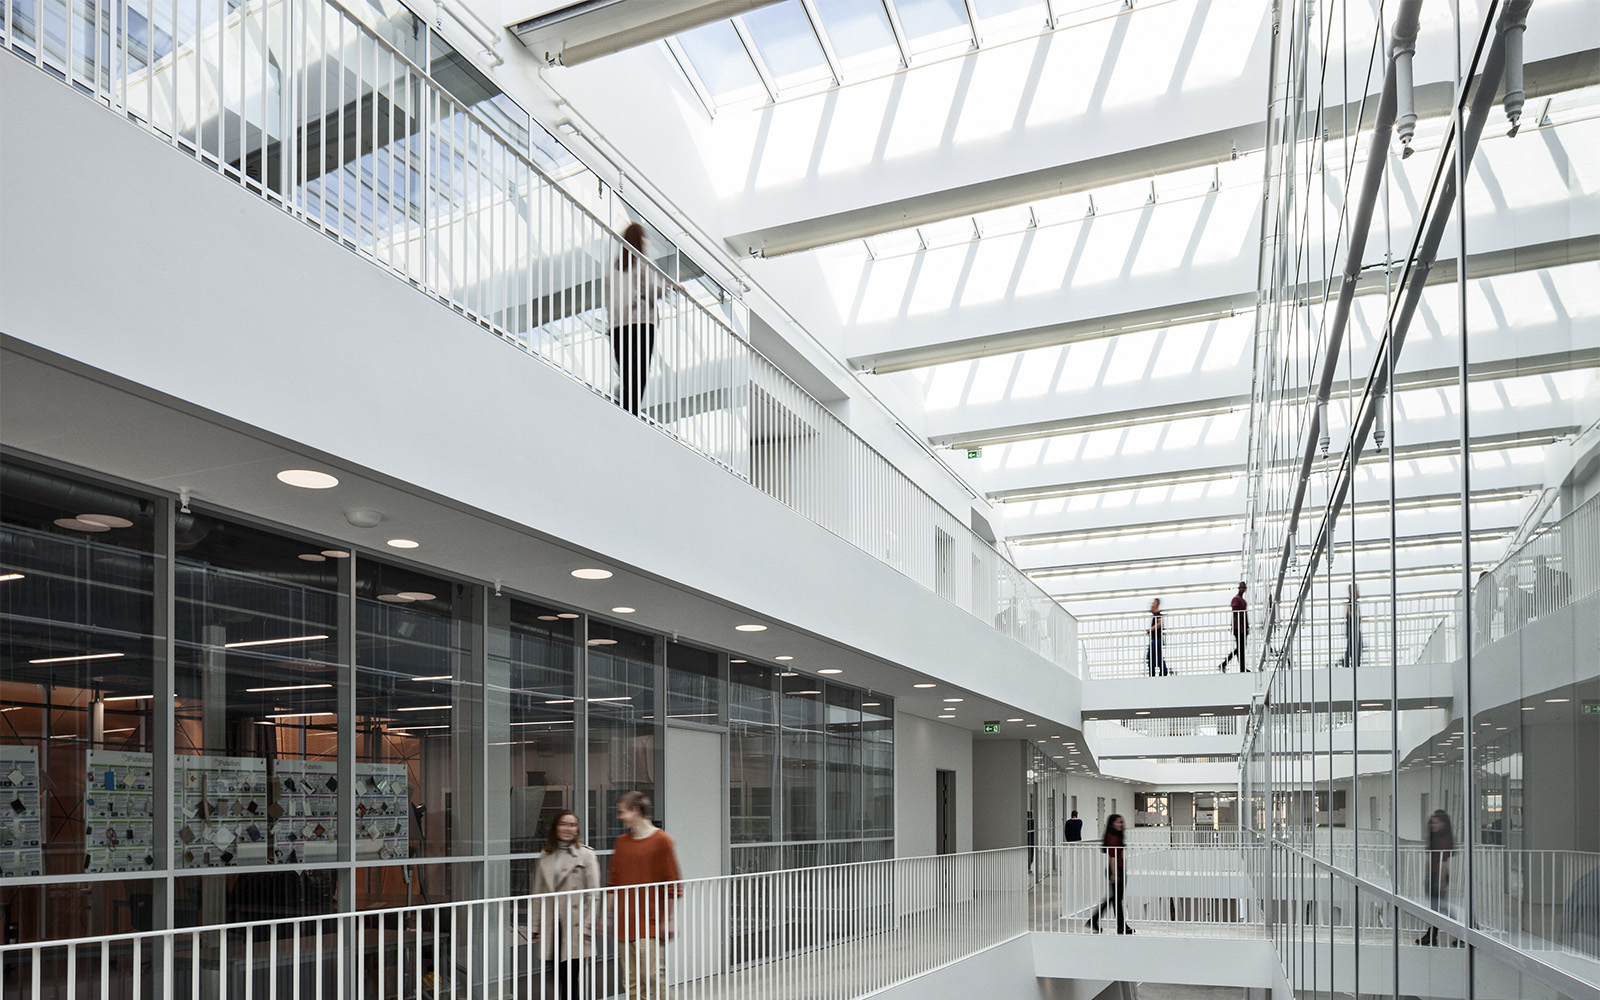 Daylight vs artificial light in school building